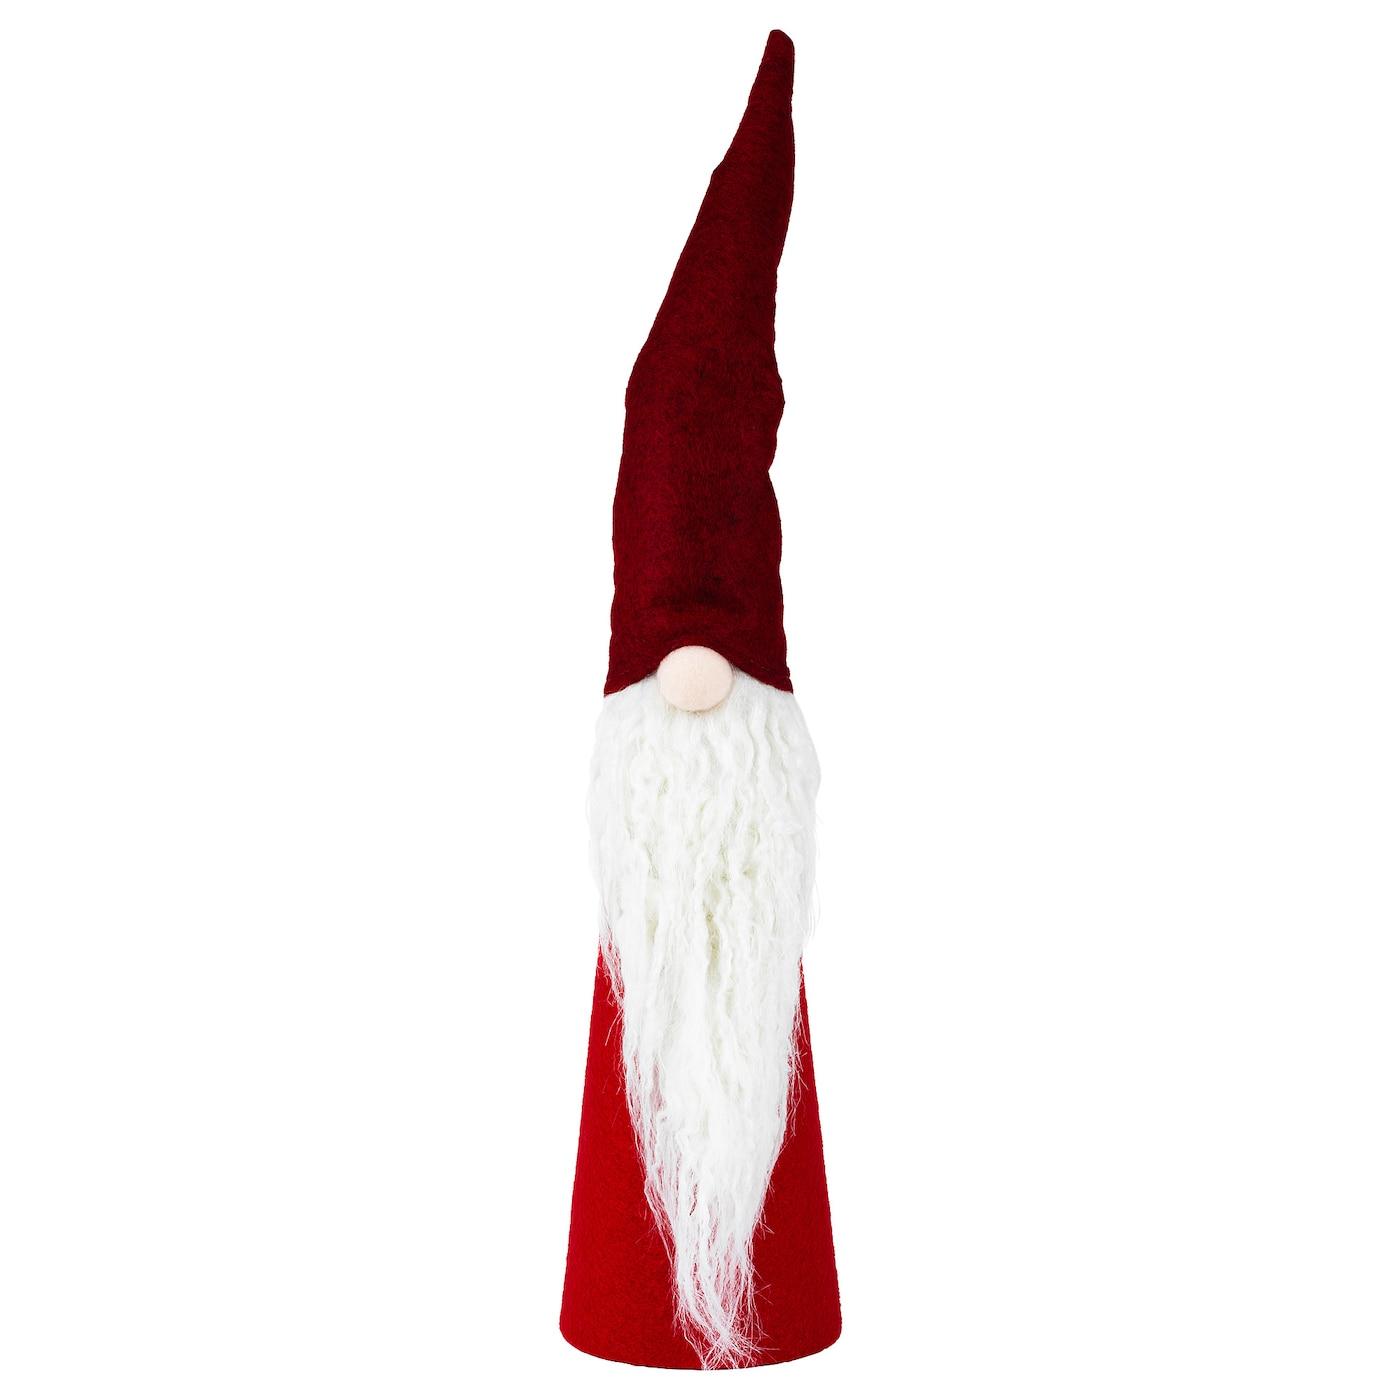 VINTER 2020 Dekoration - kegelförmig/Weihnachtsmann rot 46 cm